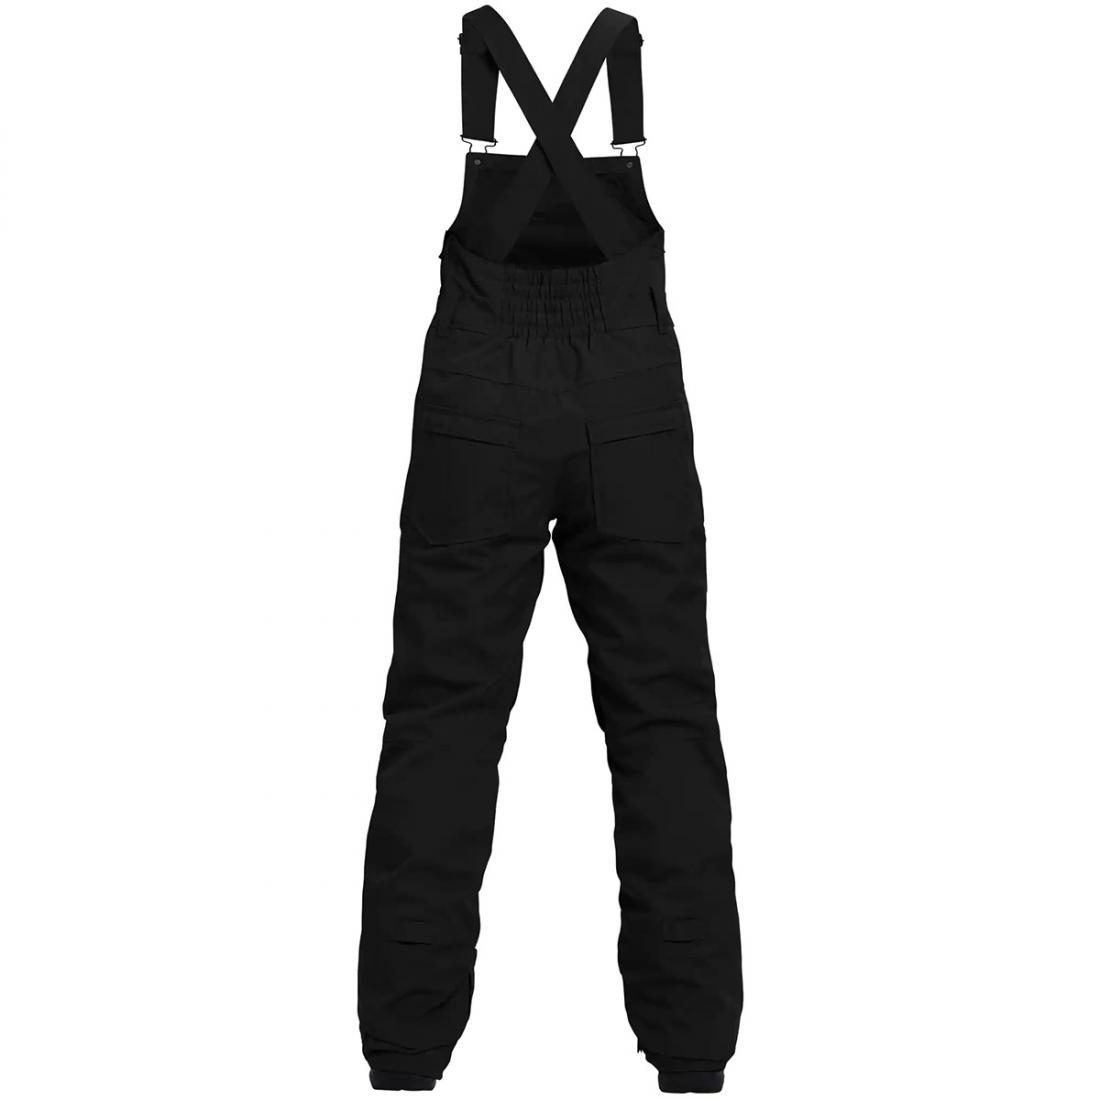 Штаны для сноуборда Burton Avalon Bib купить в Boardshop №1